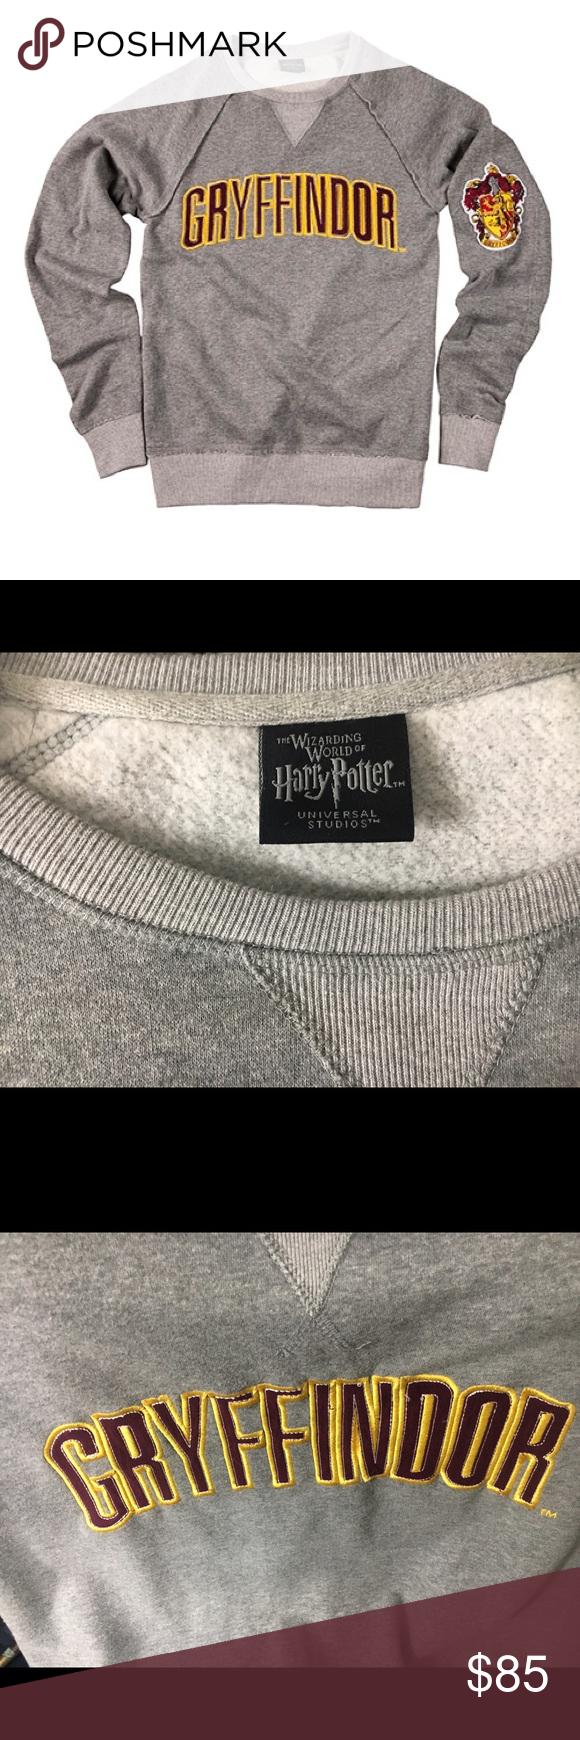 Gryffindor Sweatshirt Sweatshirts How To Wear Shirt Sweater Design [ 1740 x 580 Pixel ]